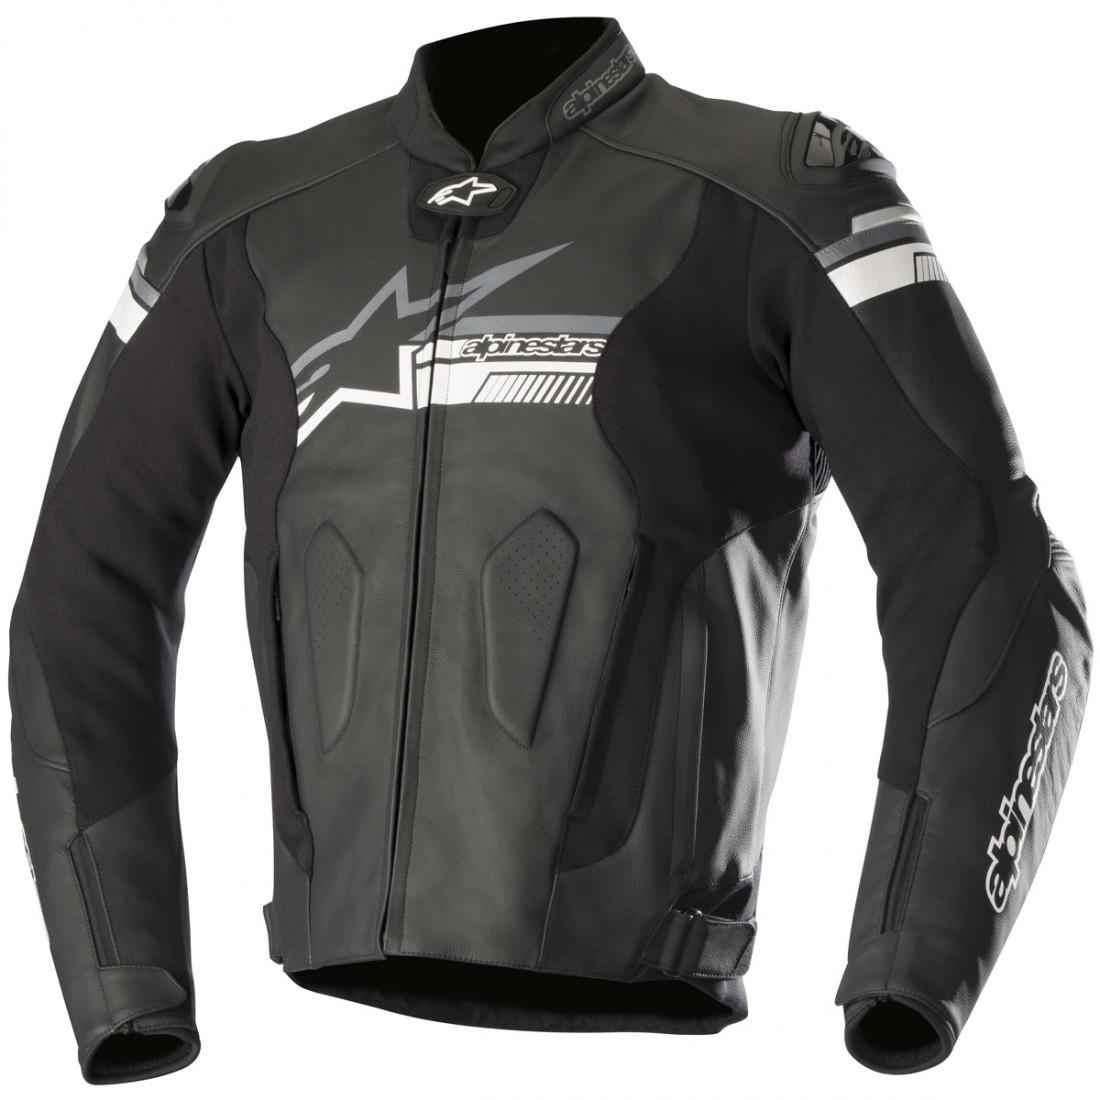 alpinestars leather jacket closeout, Alpinestars smx 6 v2